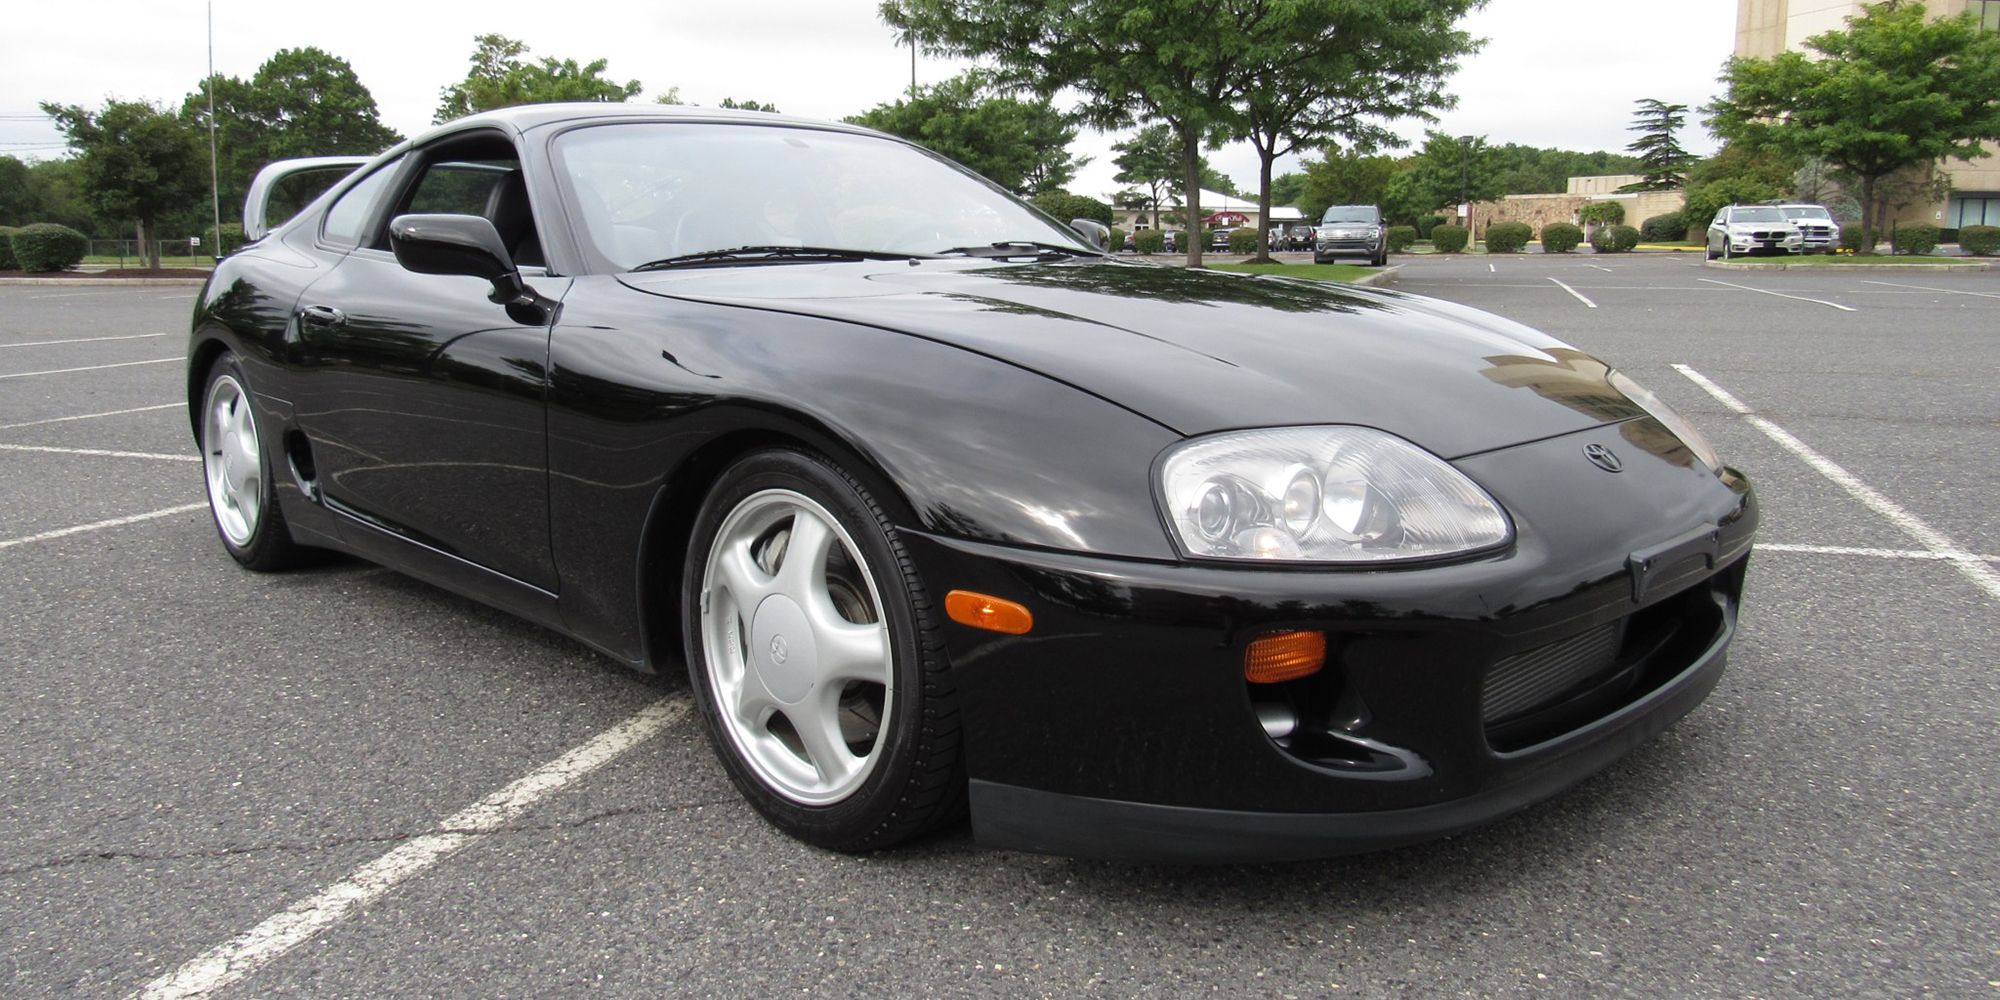 Kelebihan Kekurangan Toyota Supra 1994 Tangguh